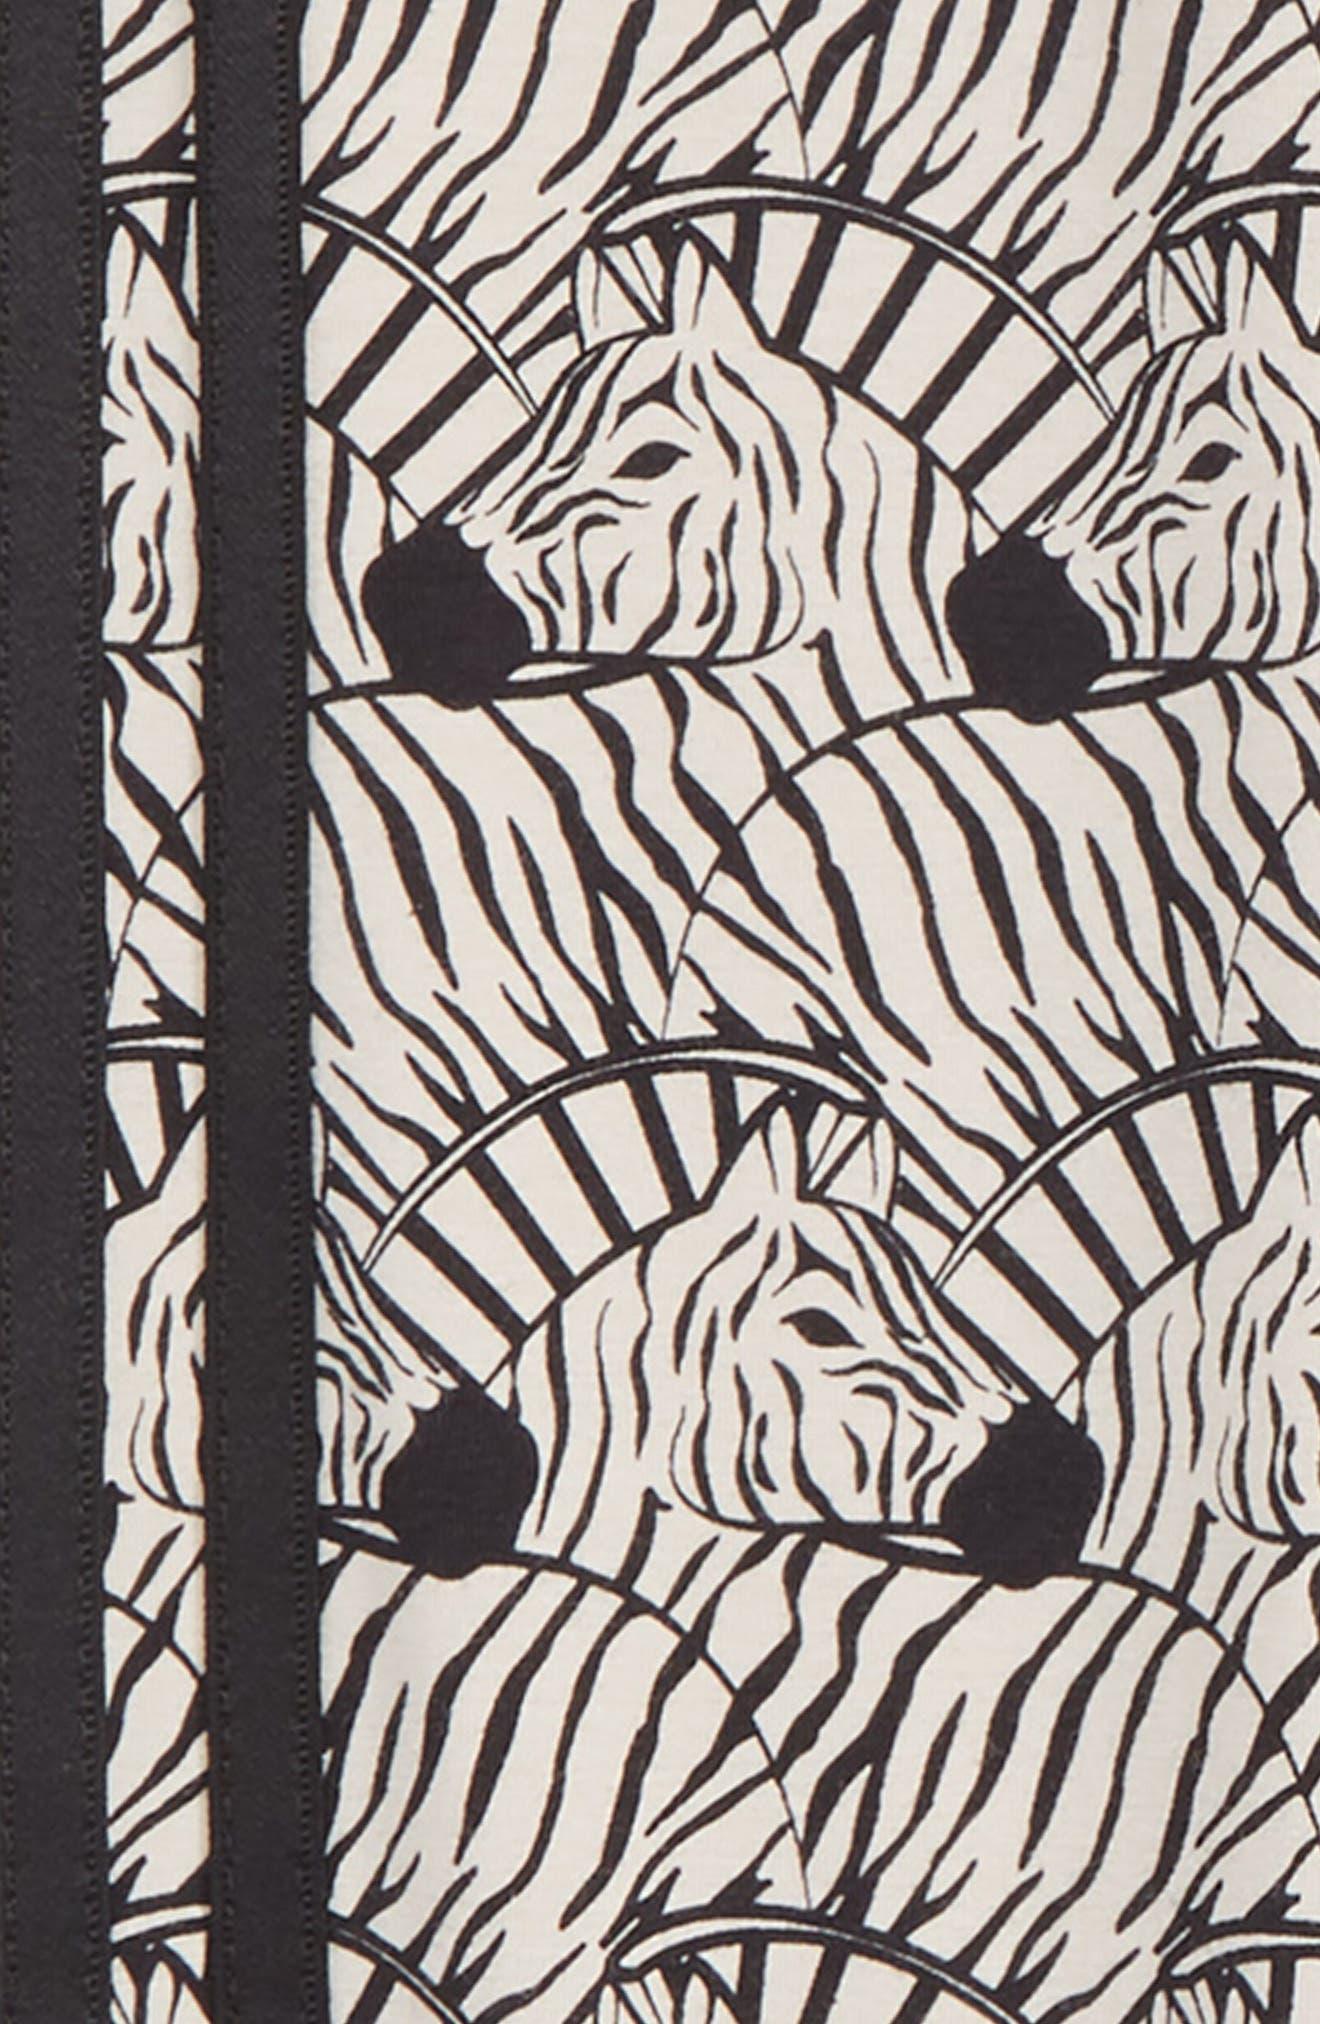 J Zebra Leggings,                             Alternate thumbnail 2, color,                             CLEAR BROWN / BLACK